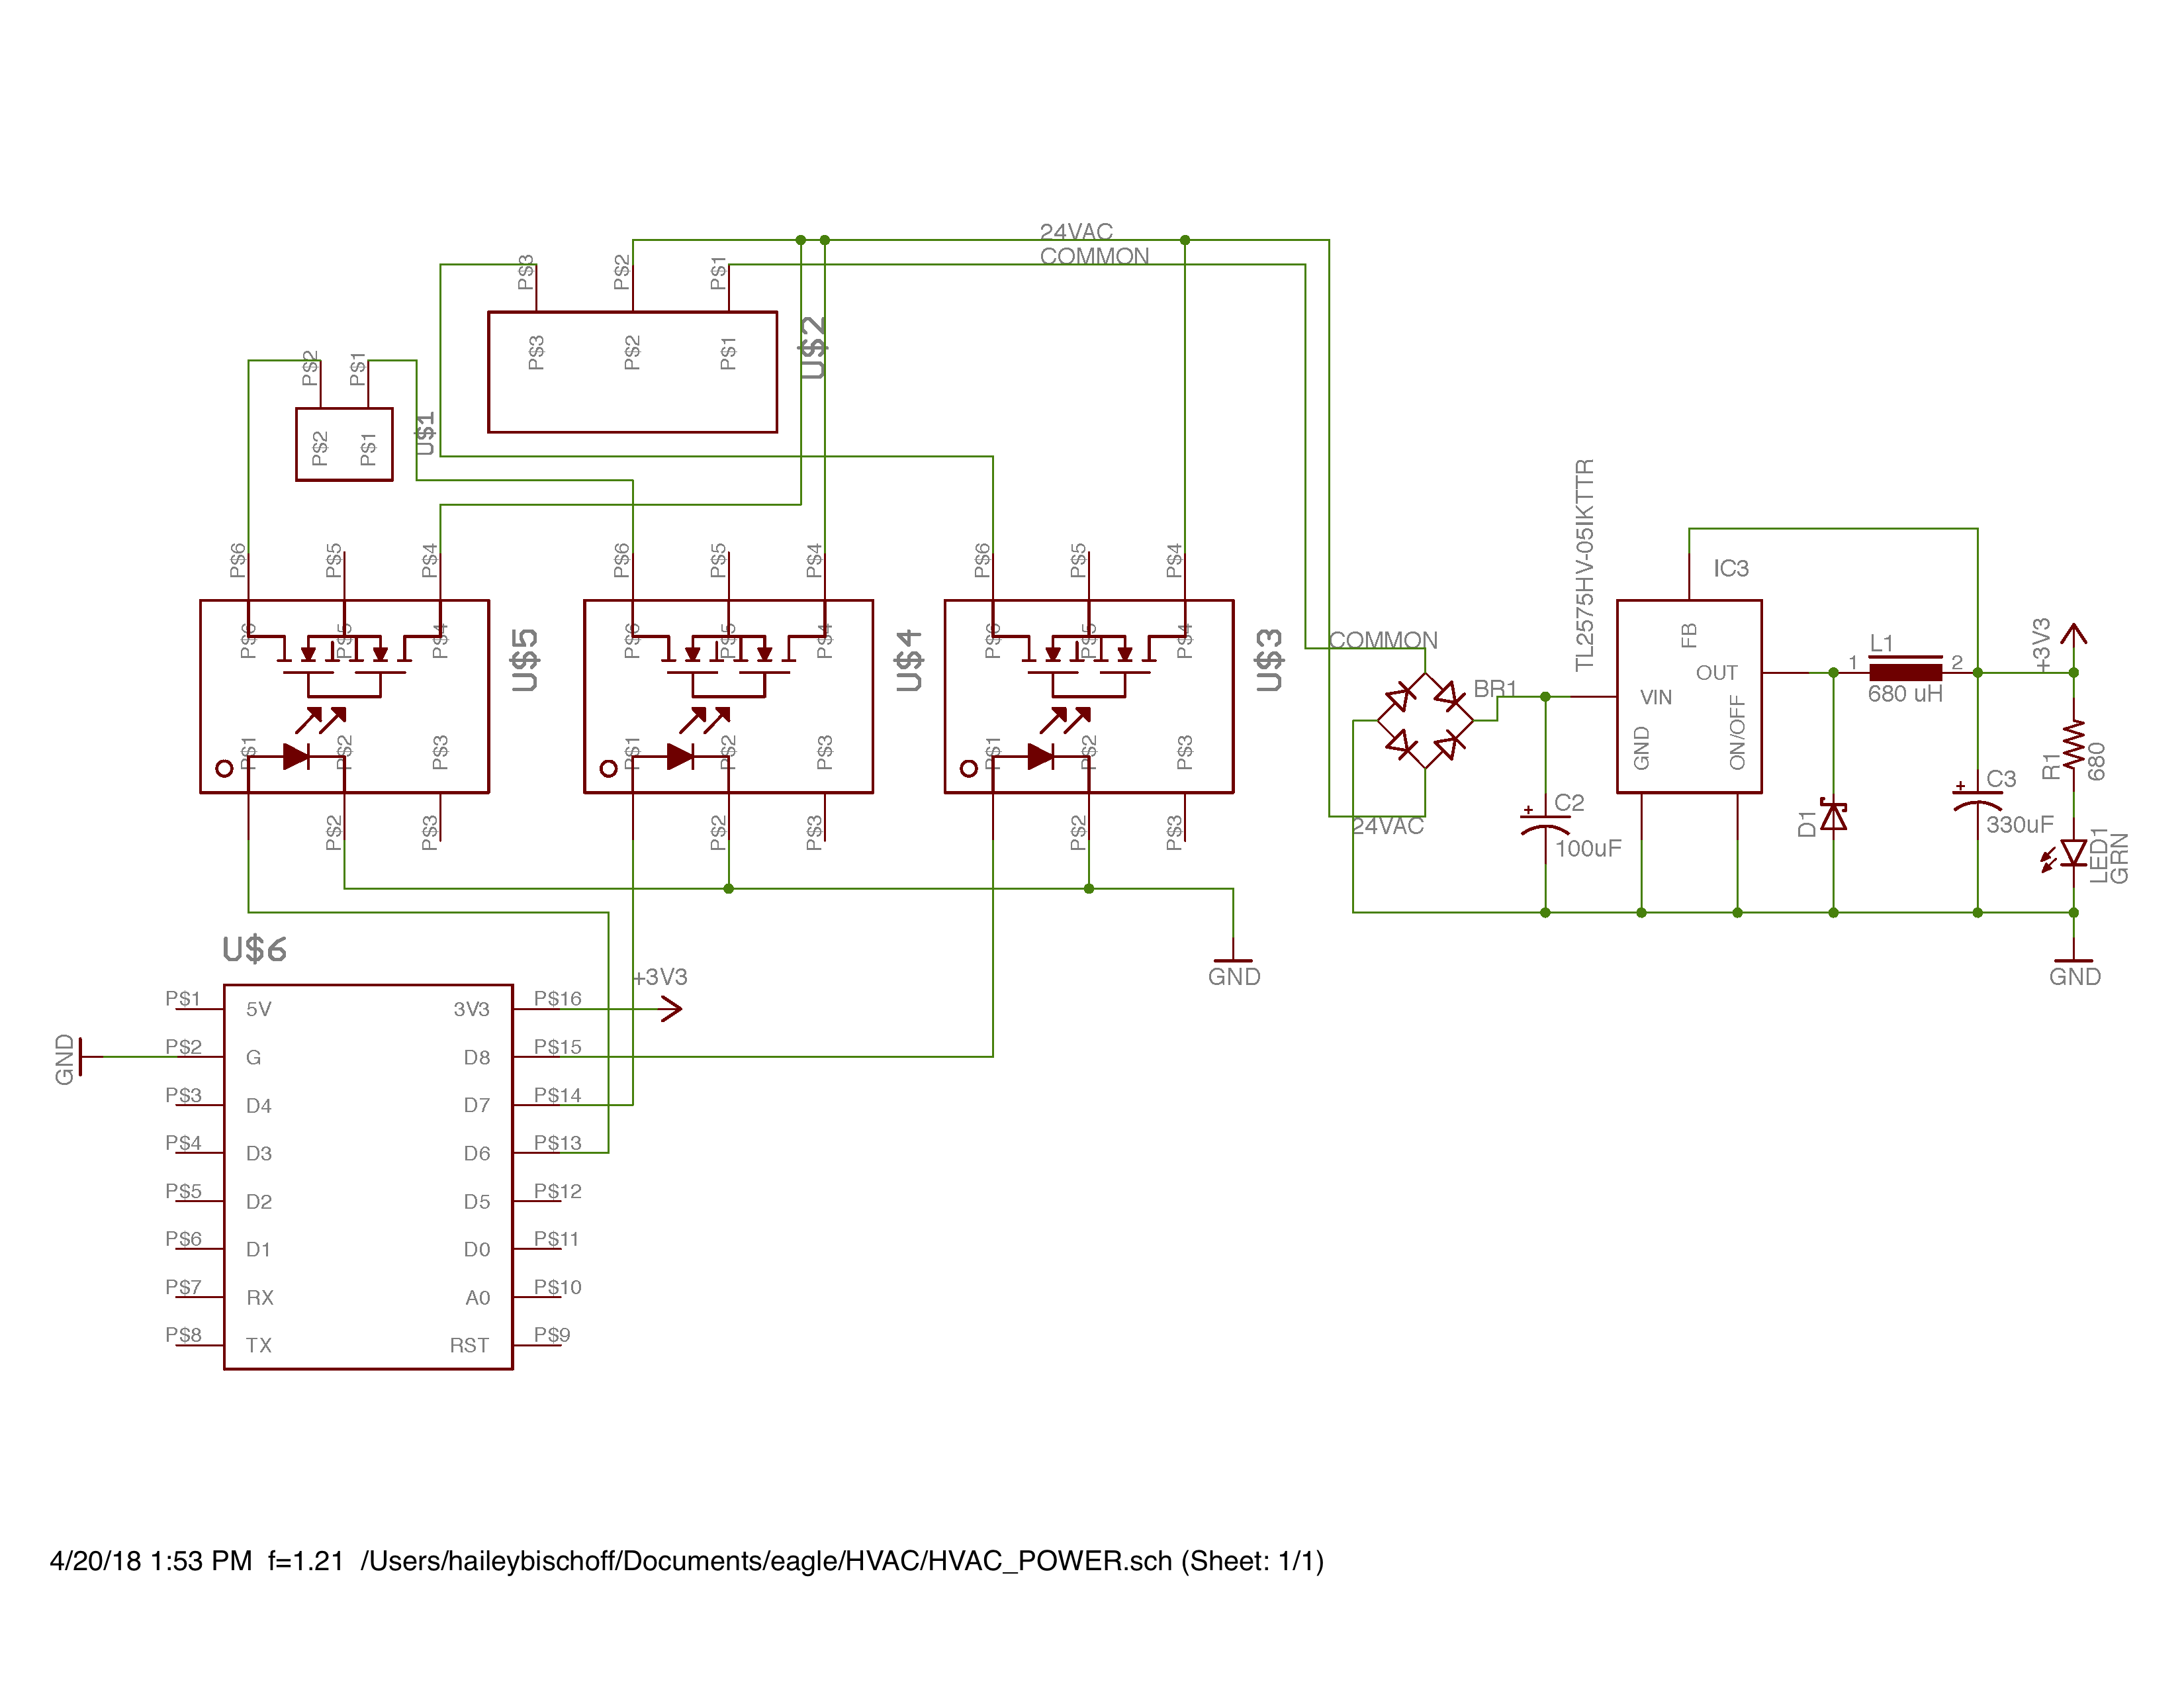 HVAC Schematic and Custom Board – Zach Brogan on hvac transformer, hvac condenser fans, hvac technology, hvac brands, hvac education, hvac layouts, hvac basics refrigeration, hvac cooling tower diagram, hvac workshop, hvac troubleshooting, hvac history, hvac refrigerant types, hvac flow diagram, hvac t stats, hvac tools, hvac sketches, hvac wiring diagrams, hvac systems, hvac home, hvac parts,